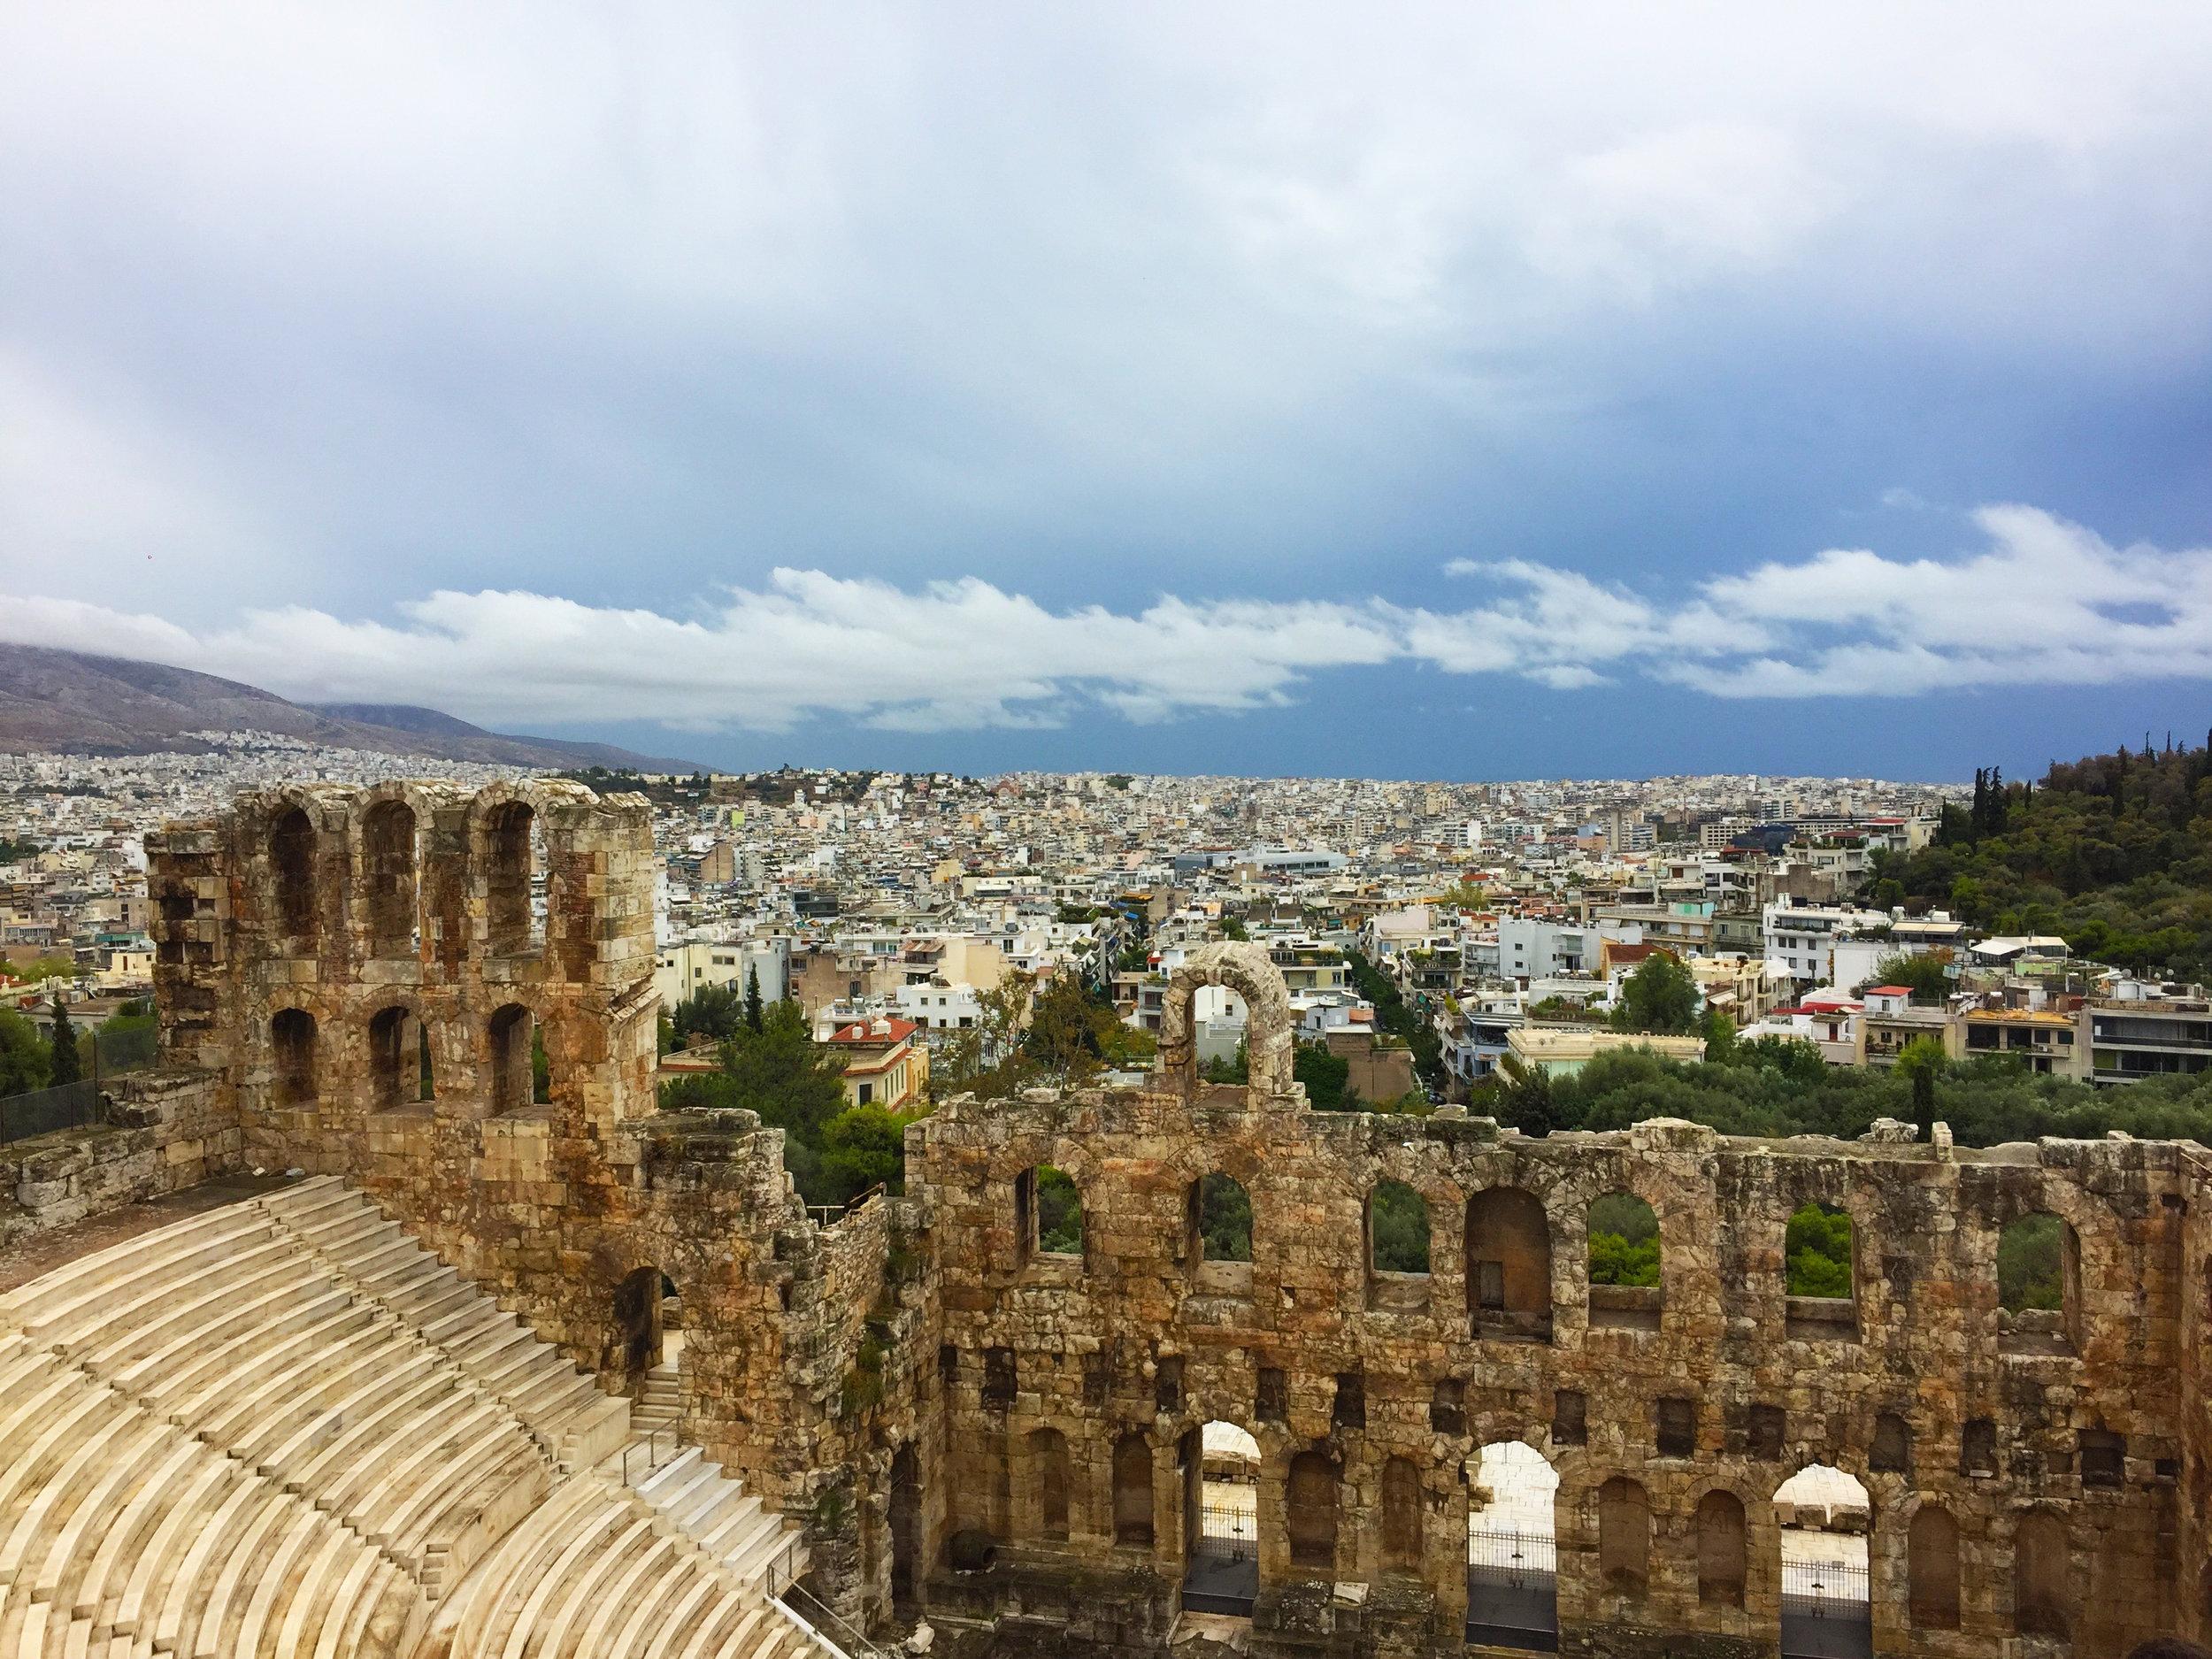 Acropolis is not a a crap oh lis.